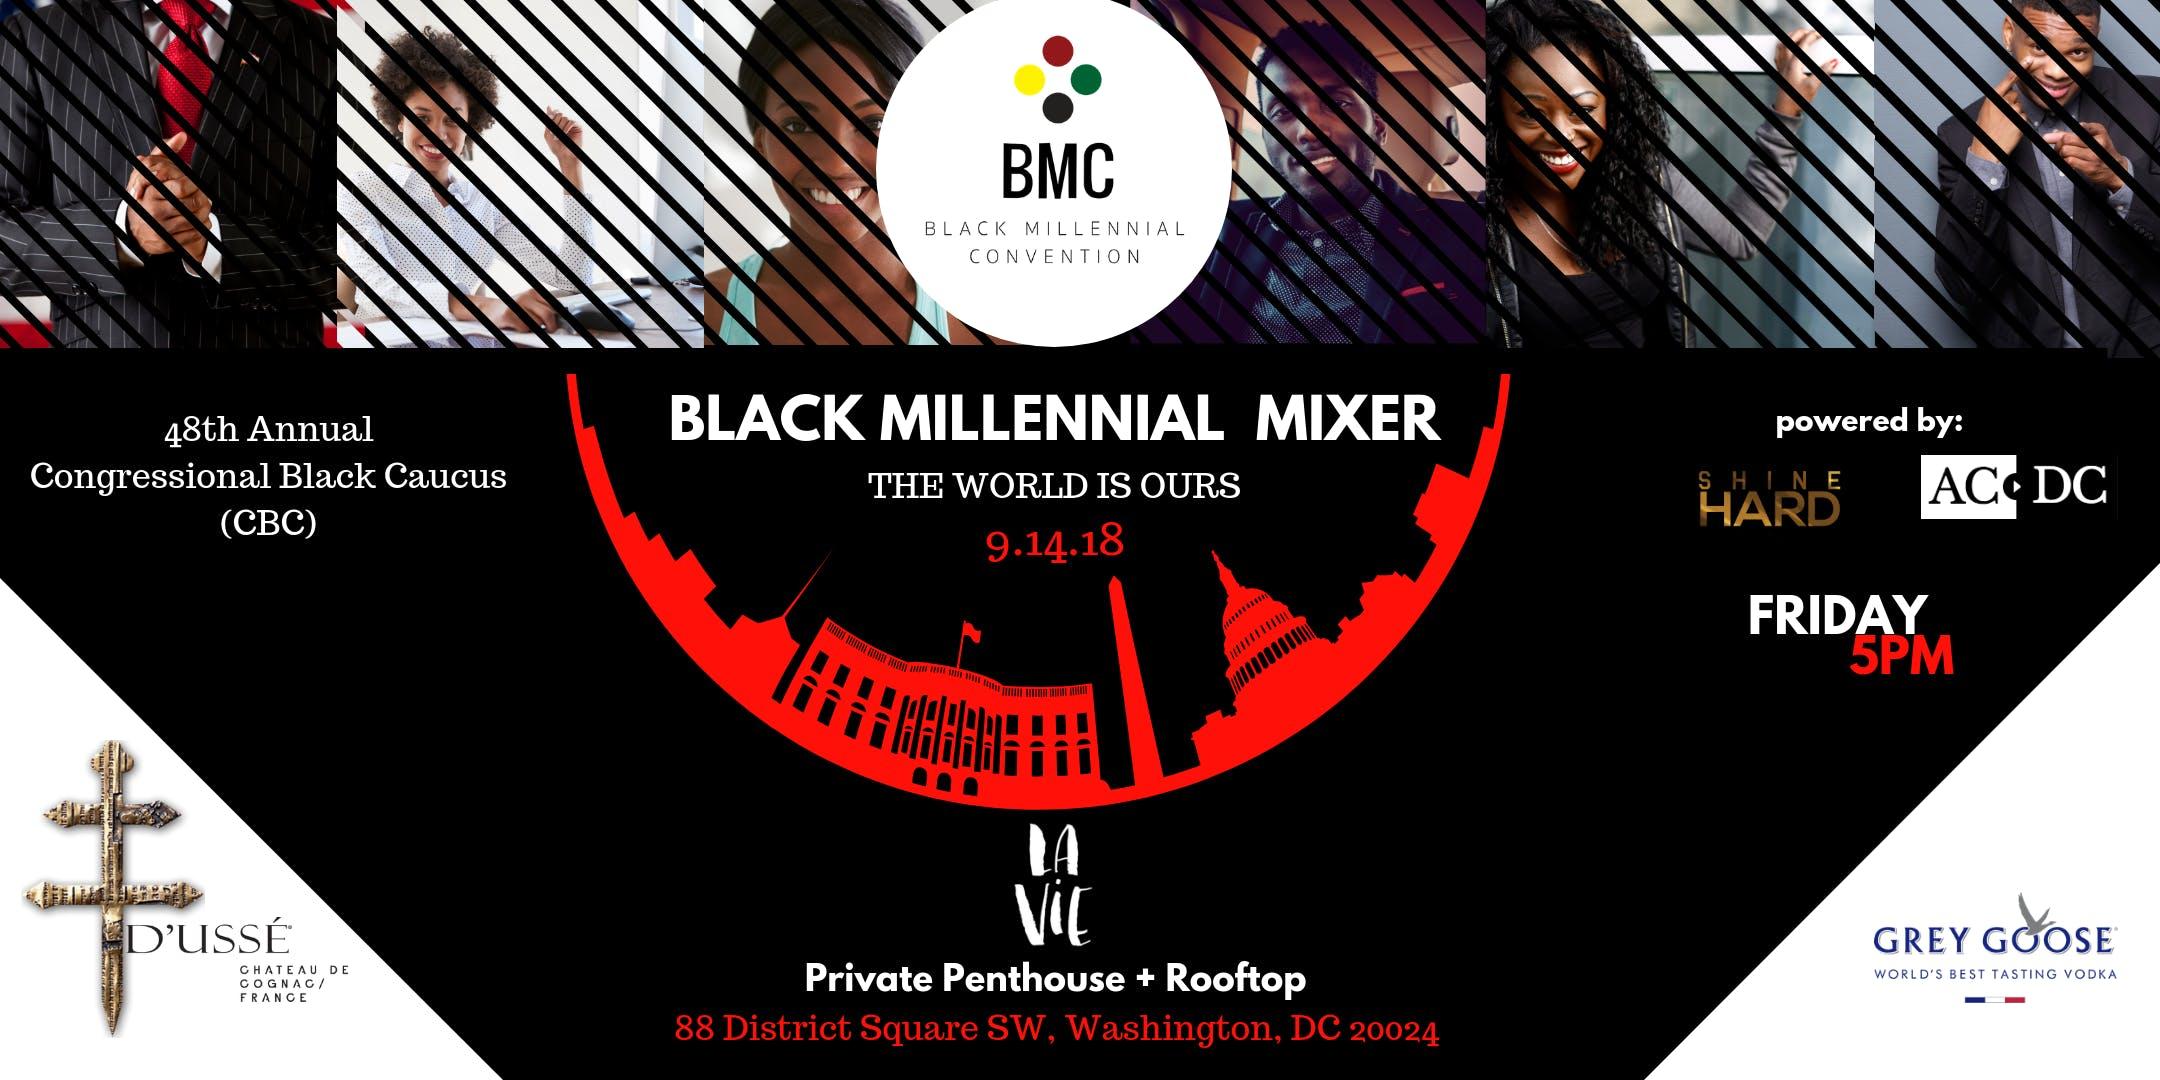 CBC - Black Millennial Mixer at the DC Wharf